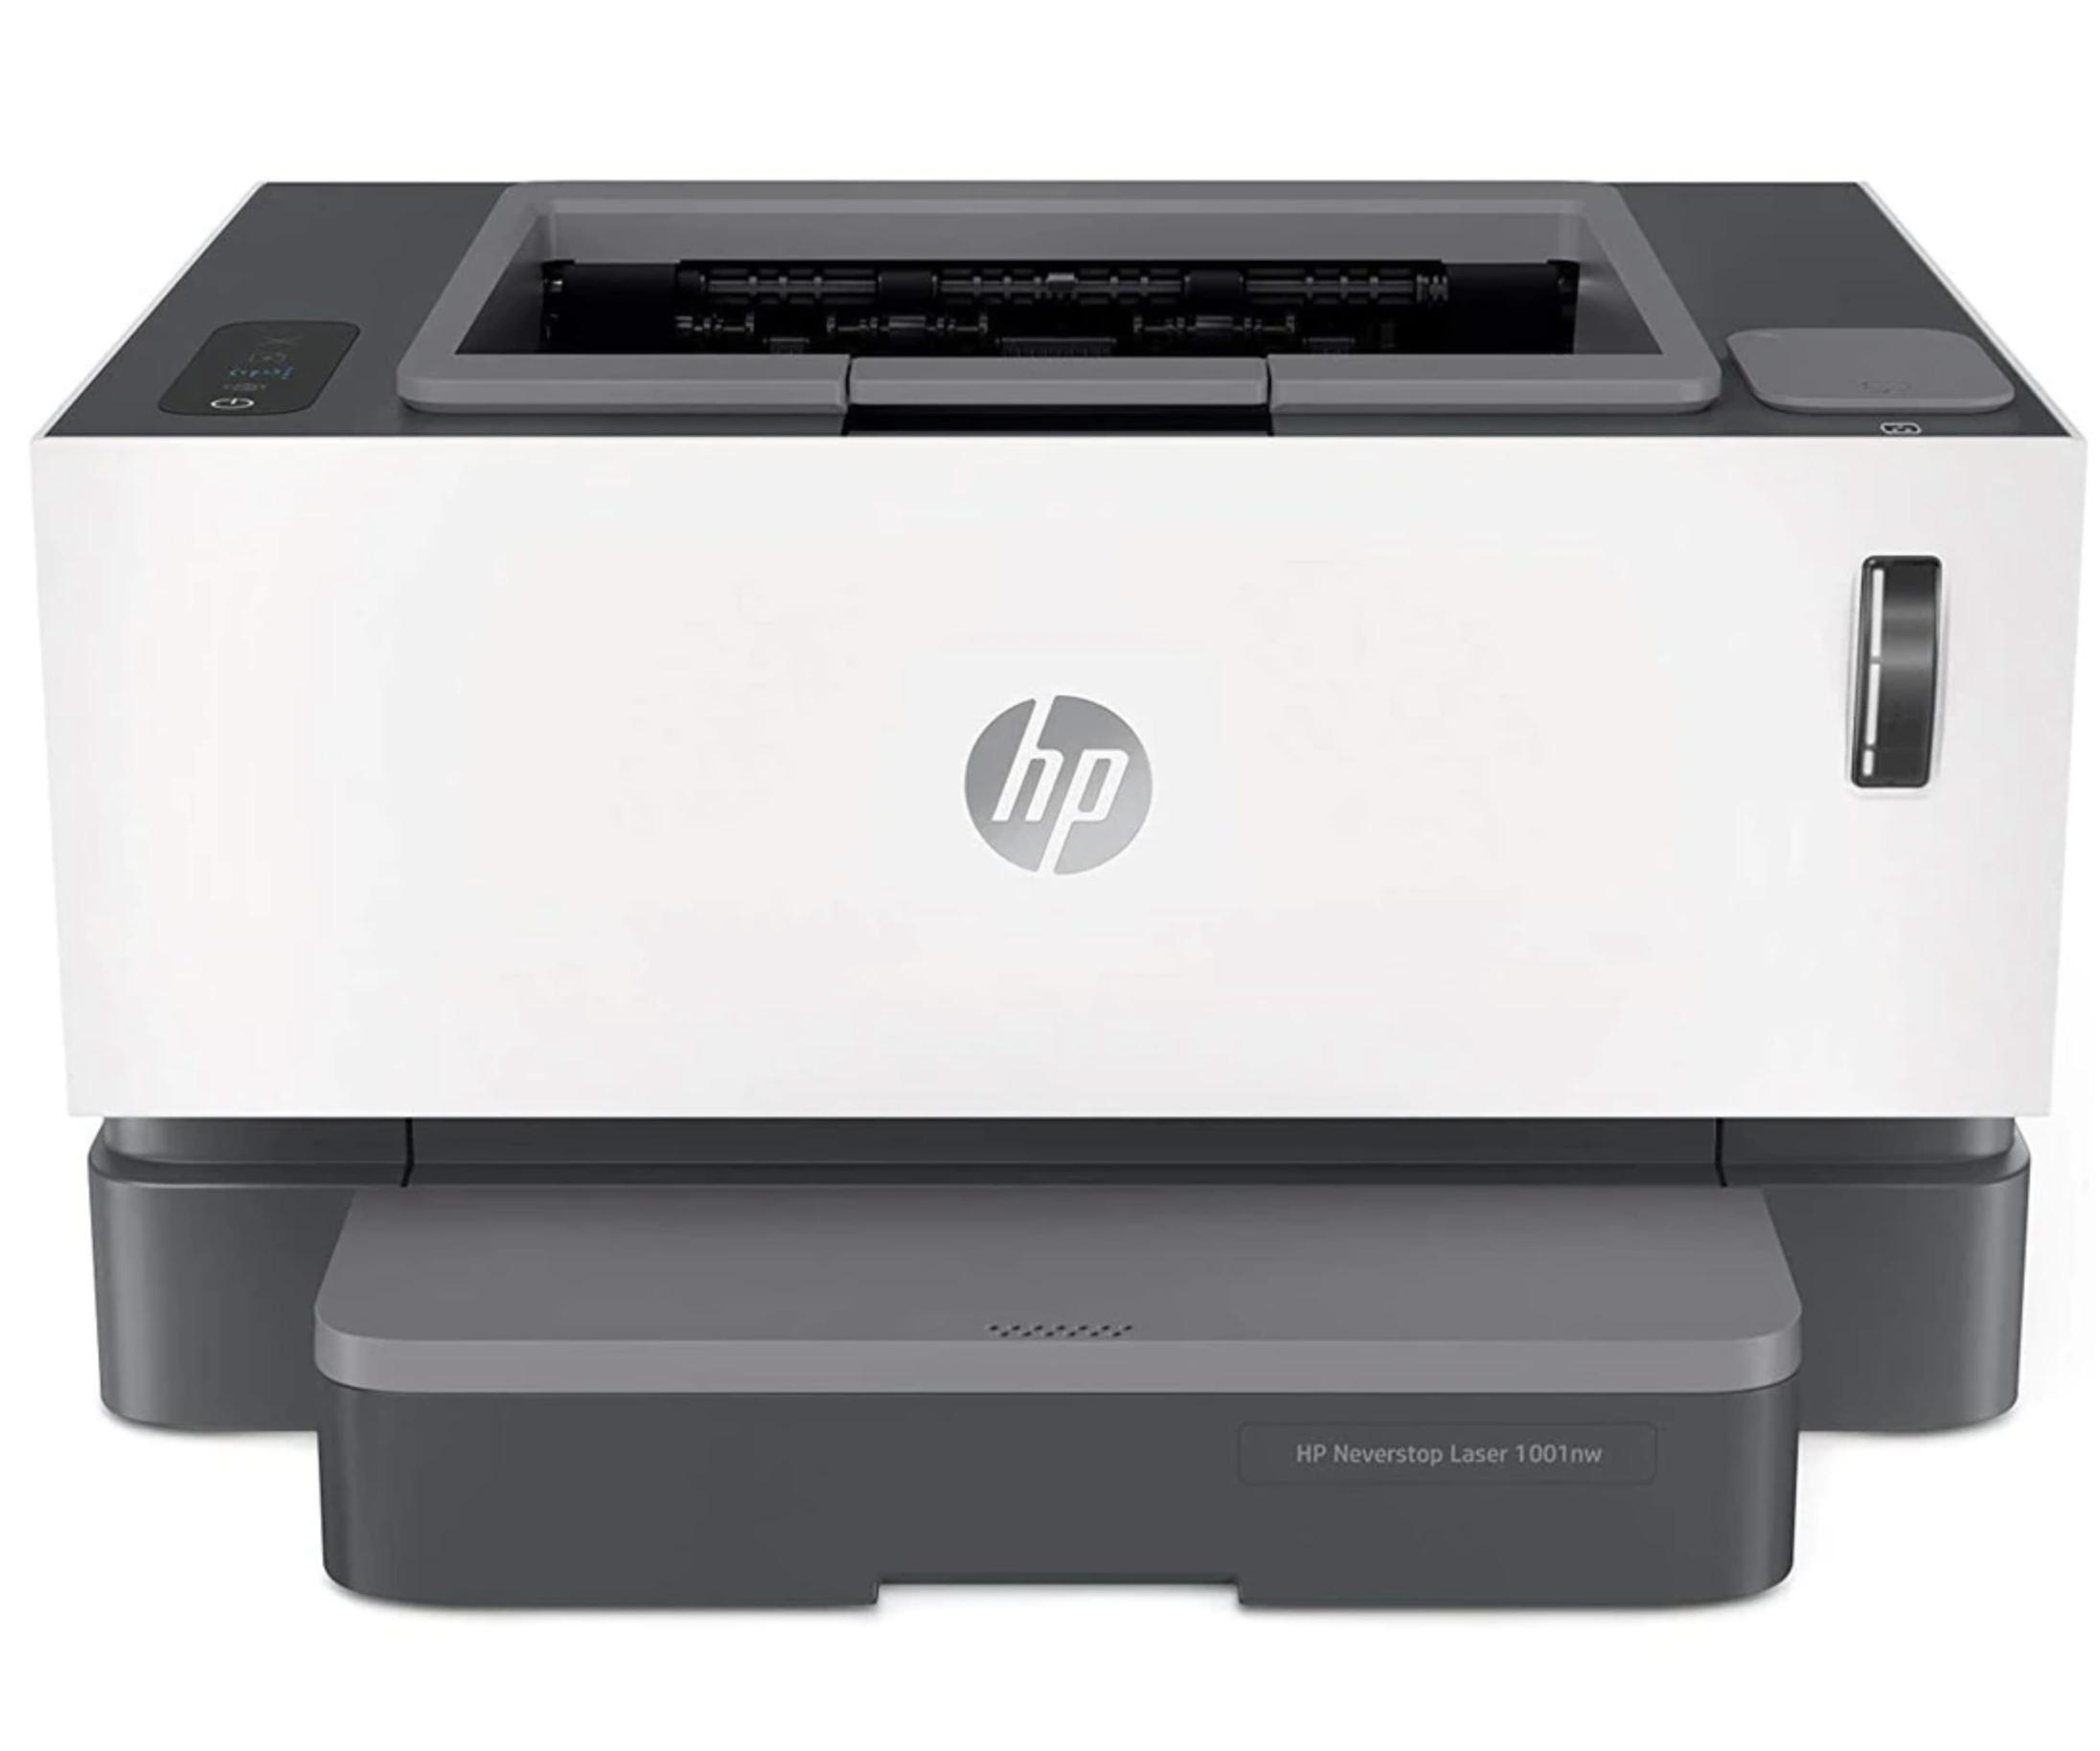 Impresora láser HP Neverstop Laser 1001nw, Wi-Fi